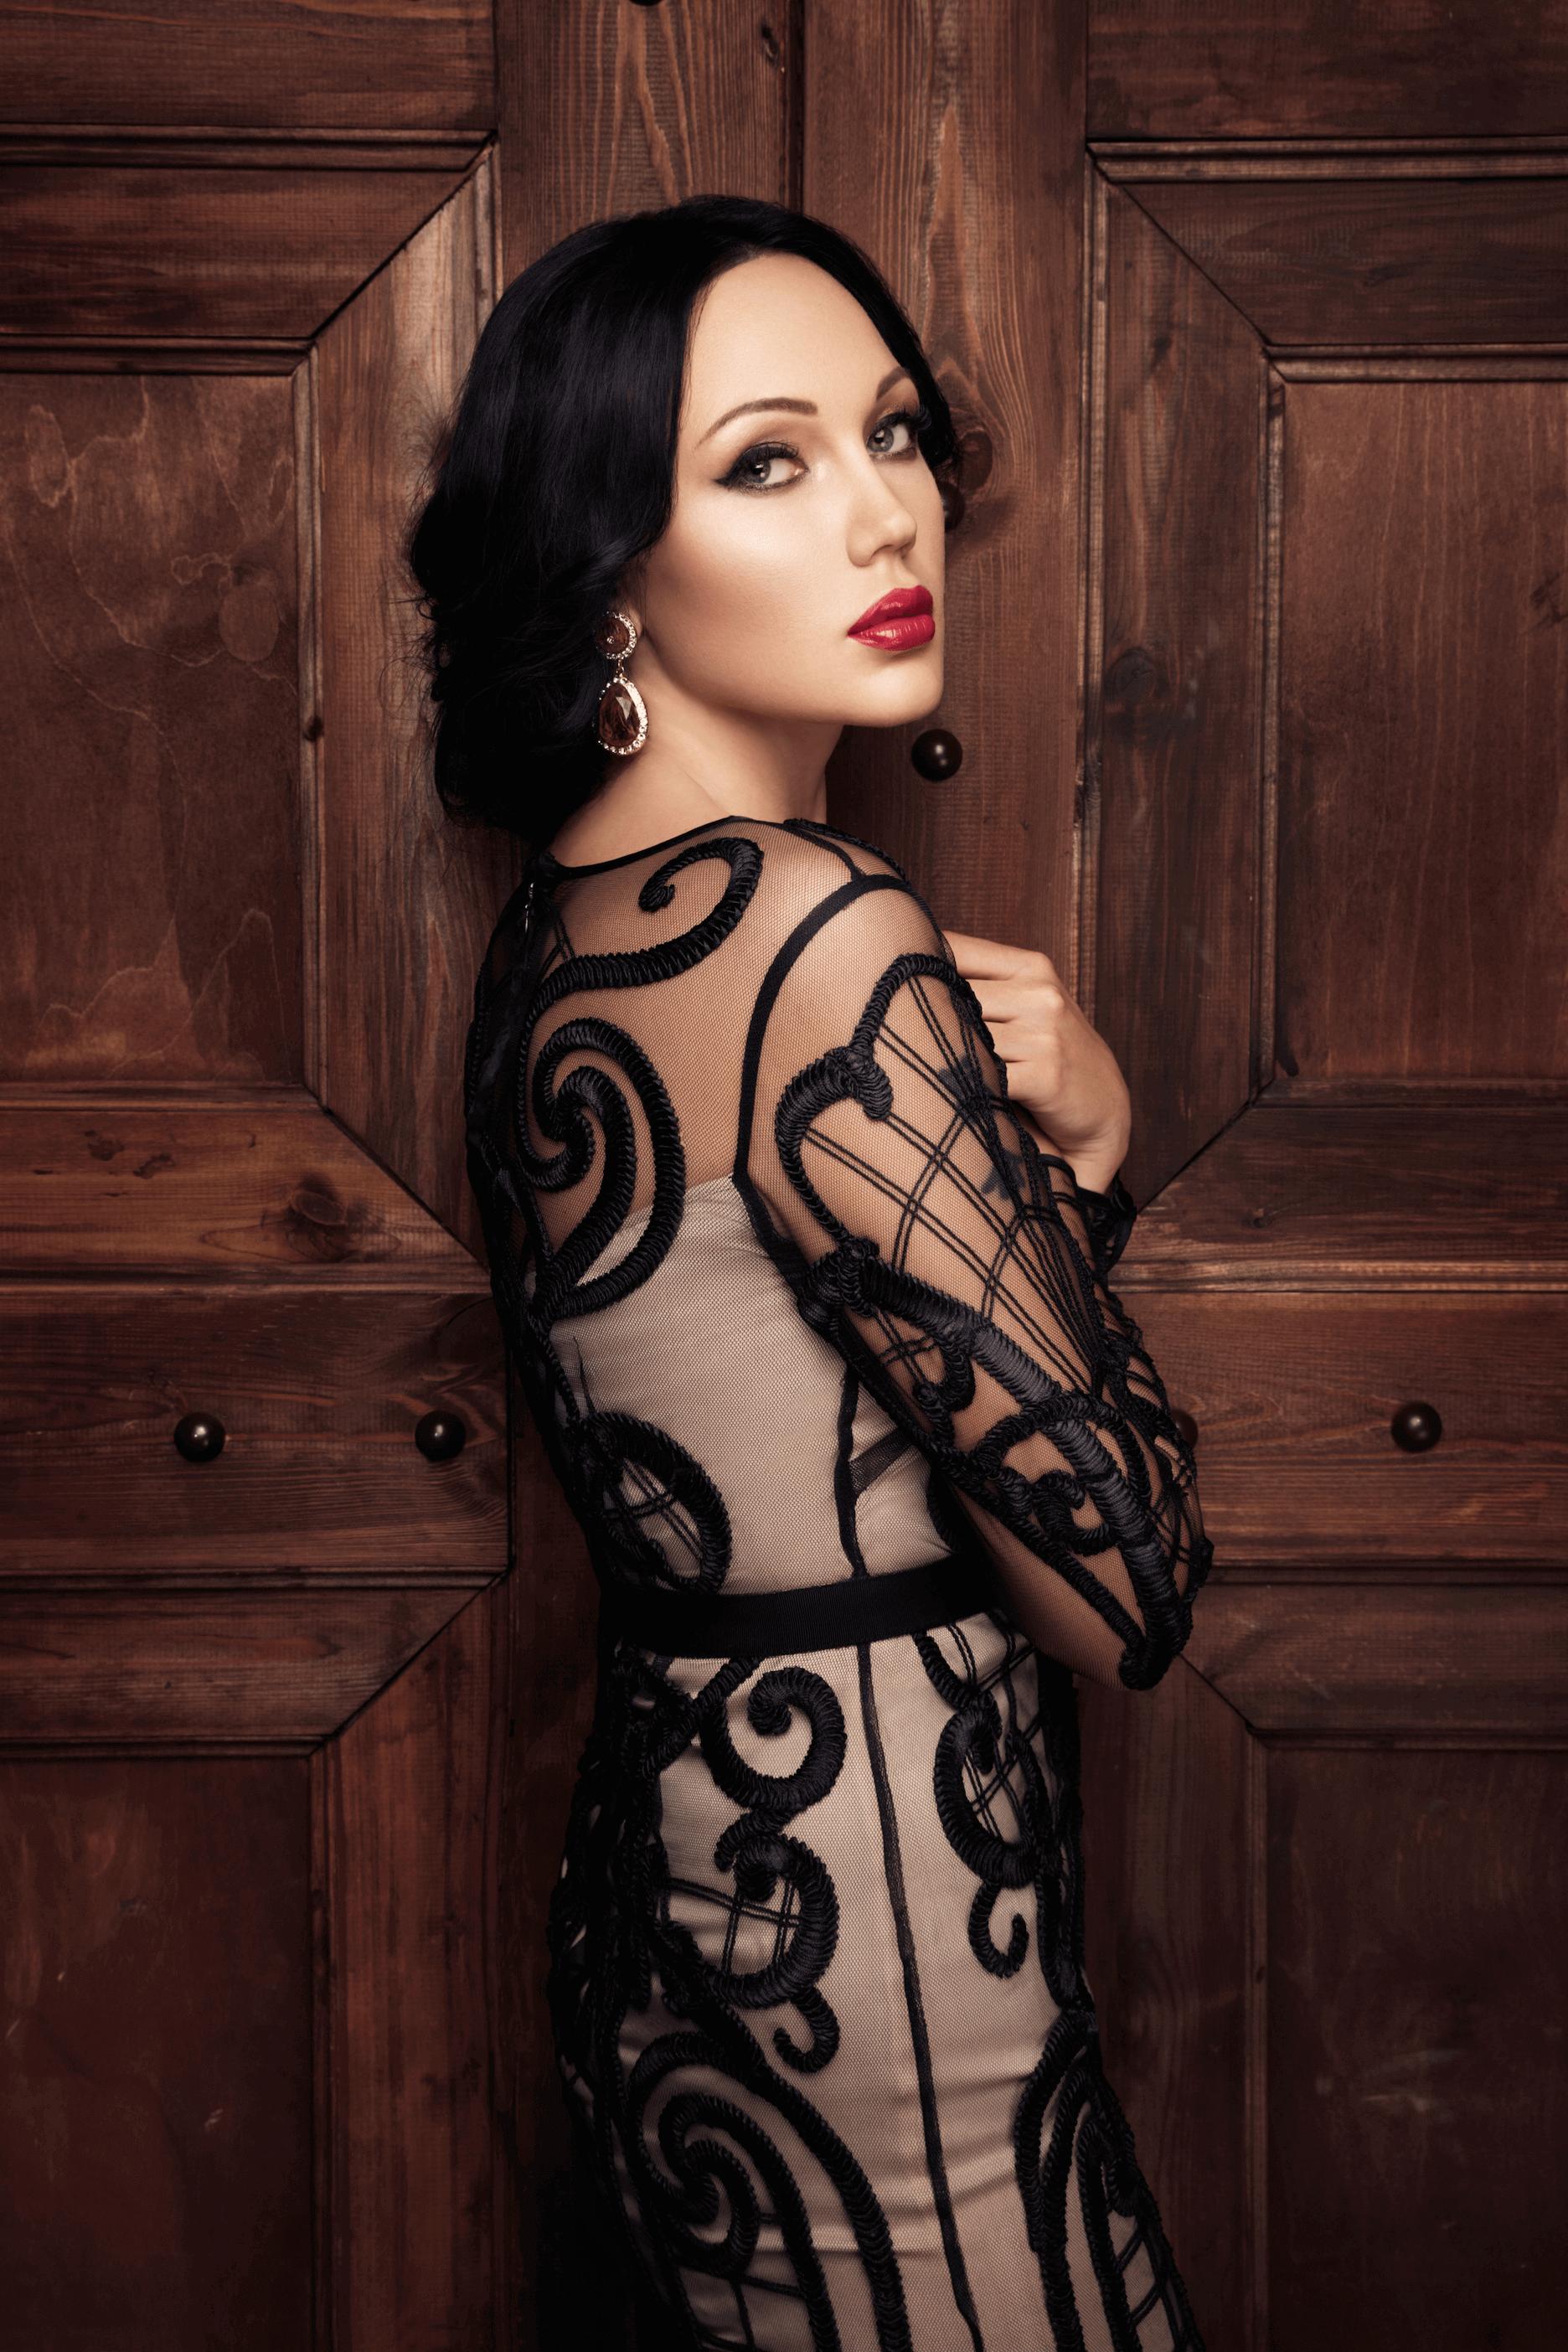 Mira и Professional make-up artist Анастасия Пашанина